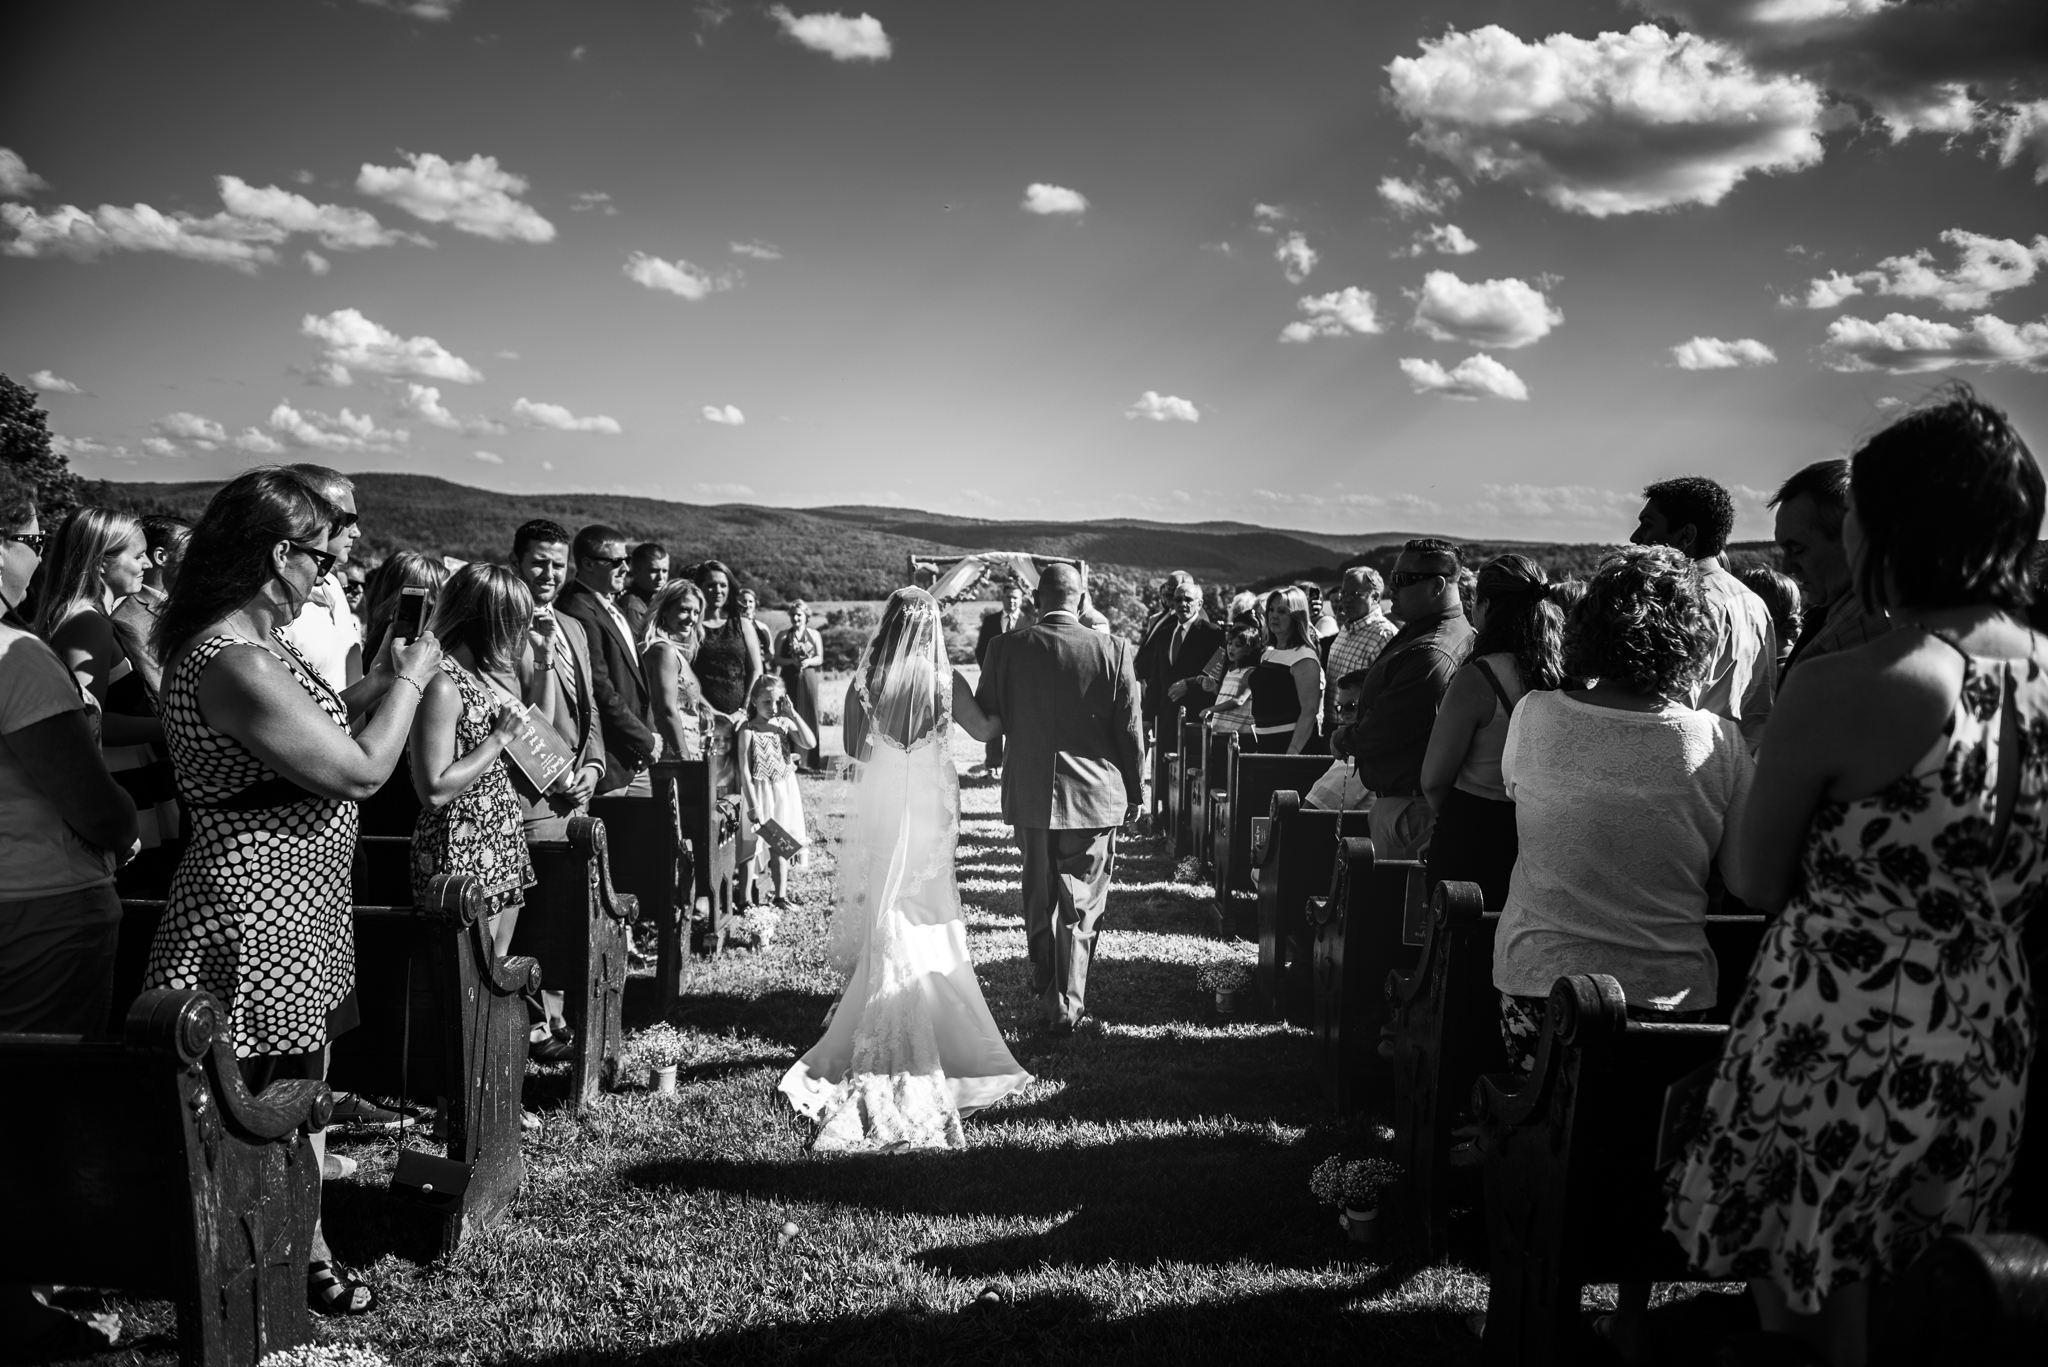 Elaine-Justin-Wedding-Online-Ceremony-39.jpg